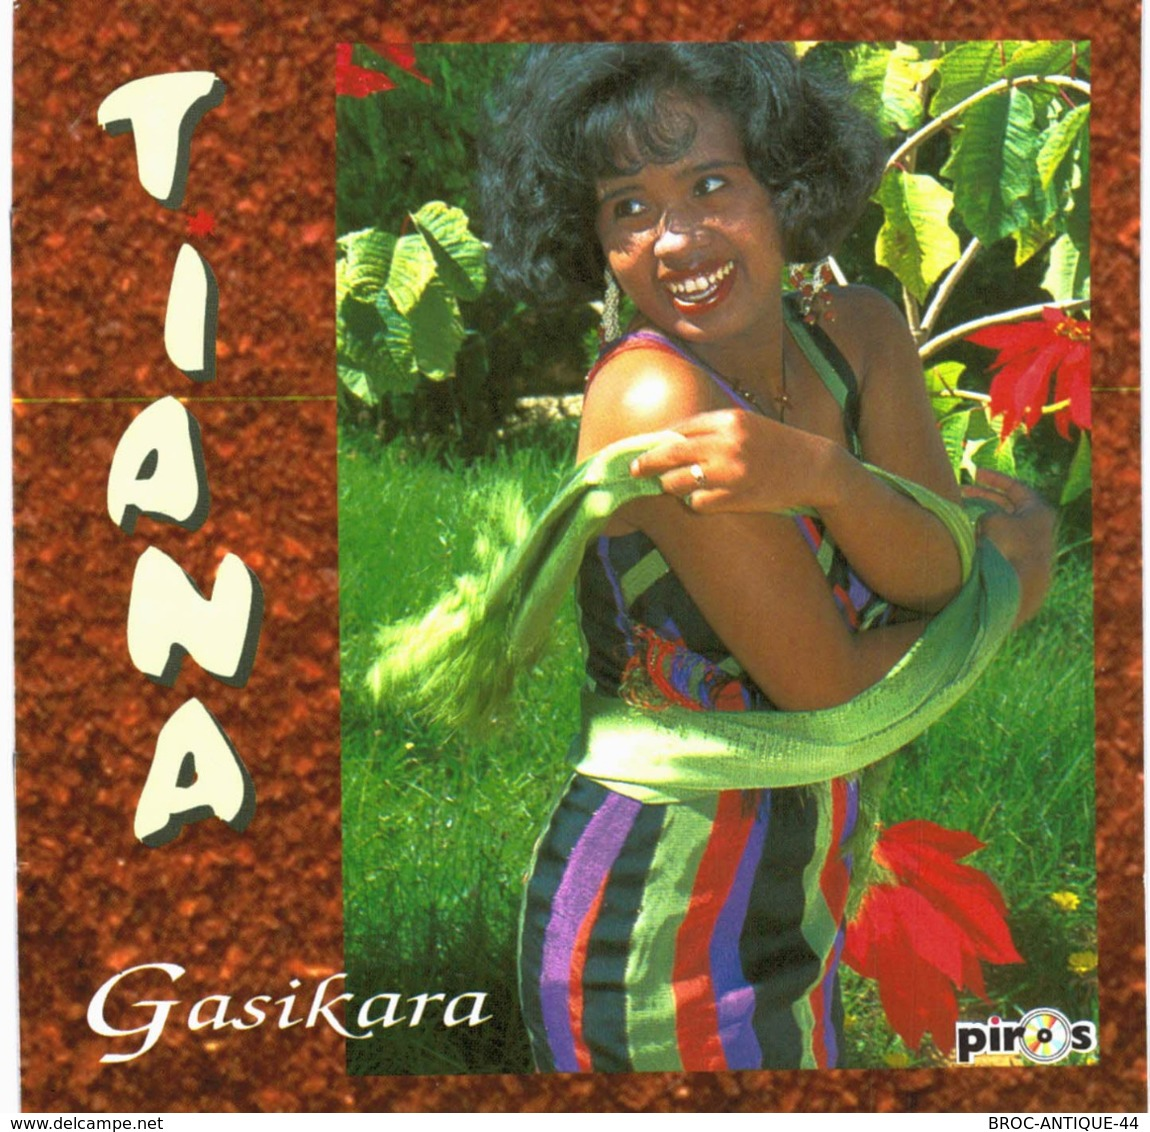 CD N°3308 - TIANA - GASIKARA - COMPILATION 11 TITRES SEGA - Wereldmuziek